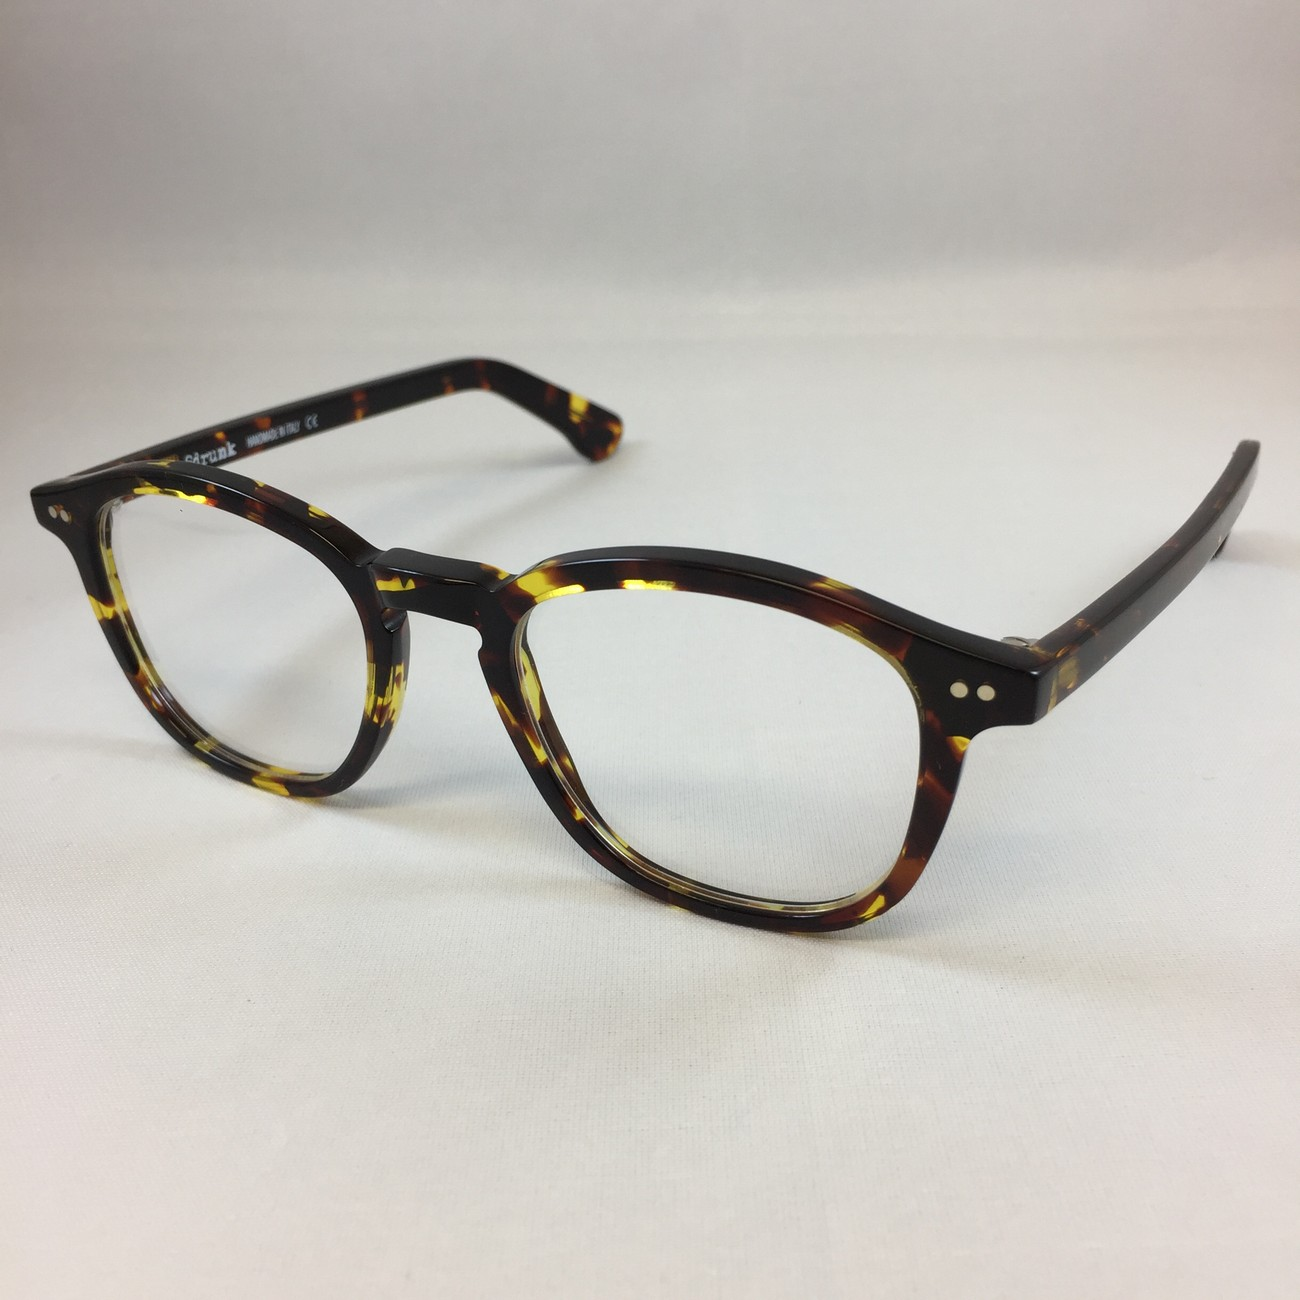 Occhiali da Vista Bob Sdrunk Woody 02 RJZIx